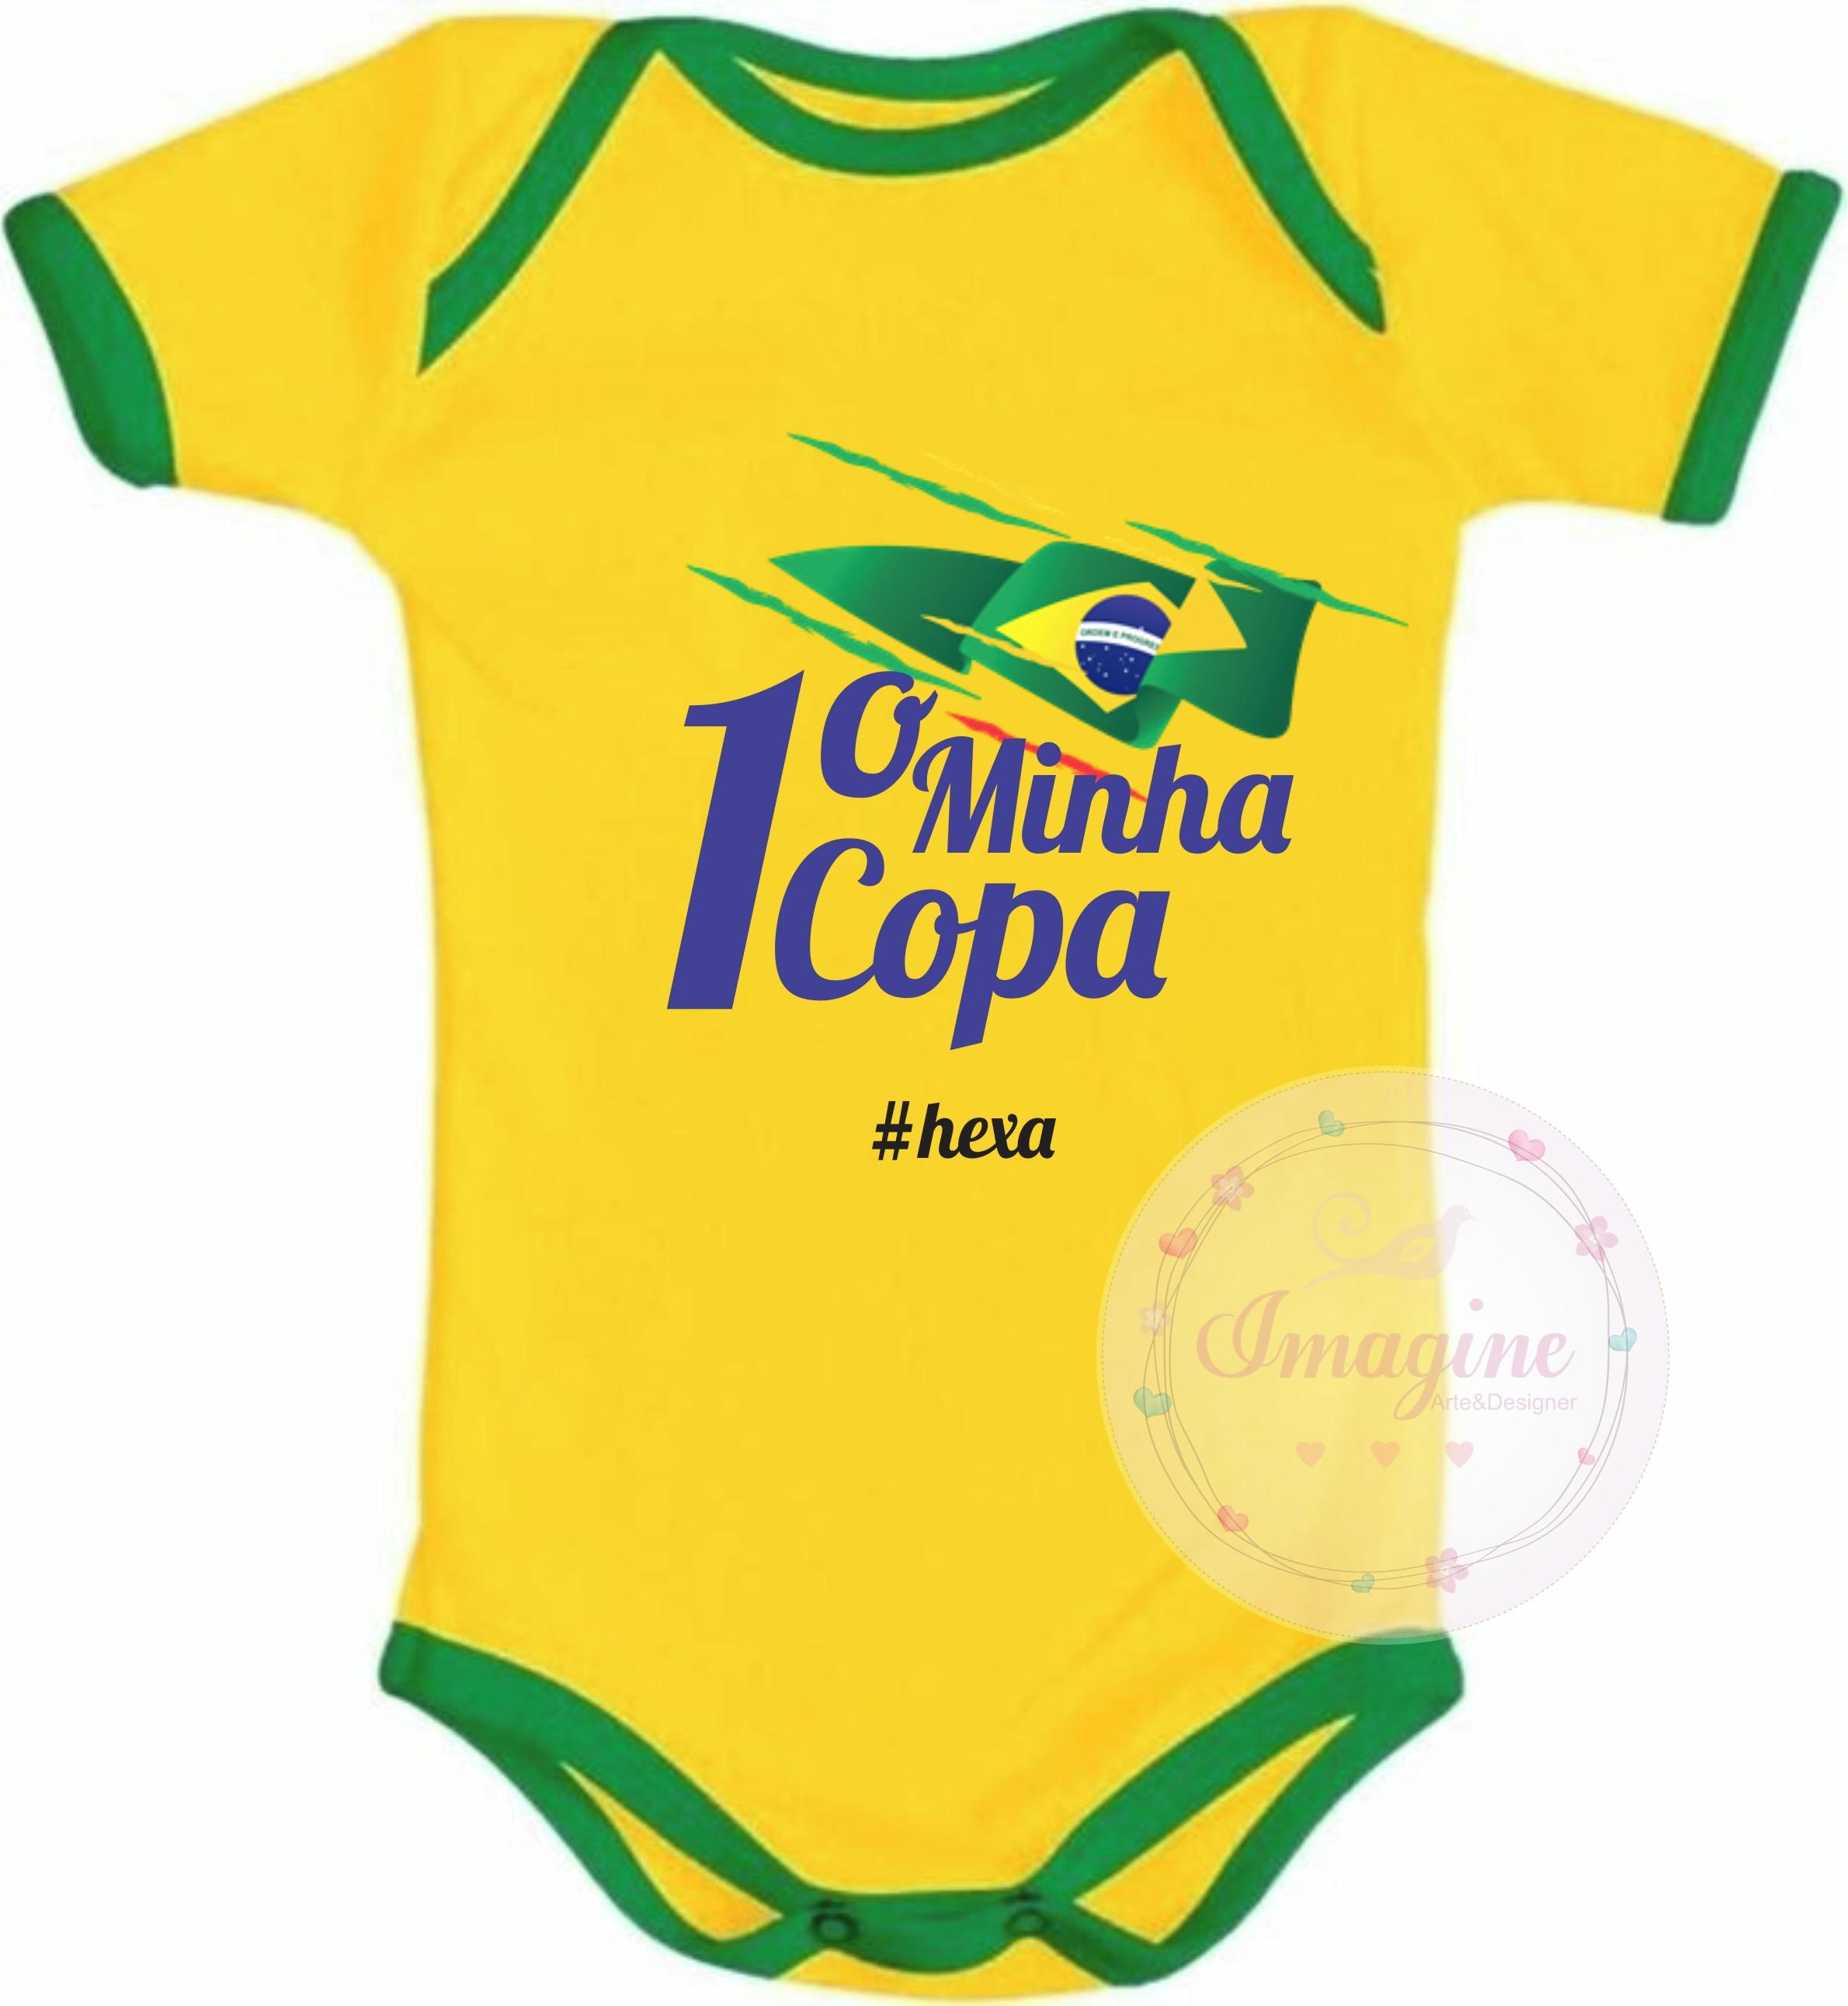 9d79c4d50f Camiseta Copa do Mundo Brasil 5 Estrelas